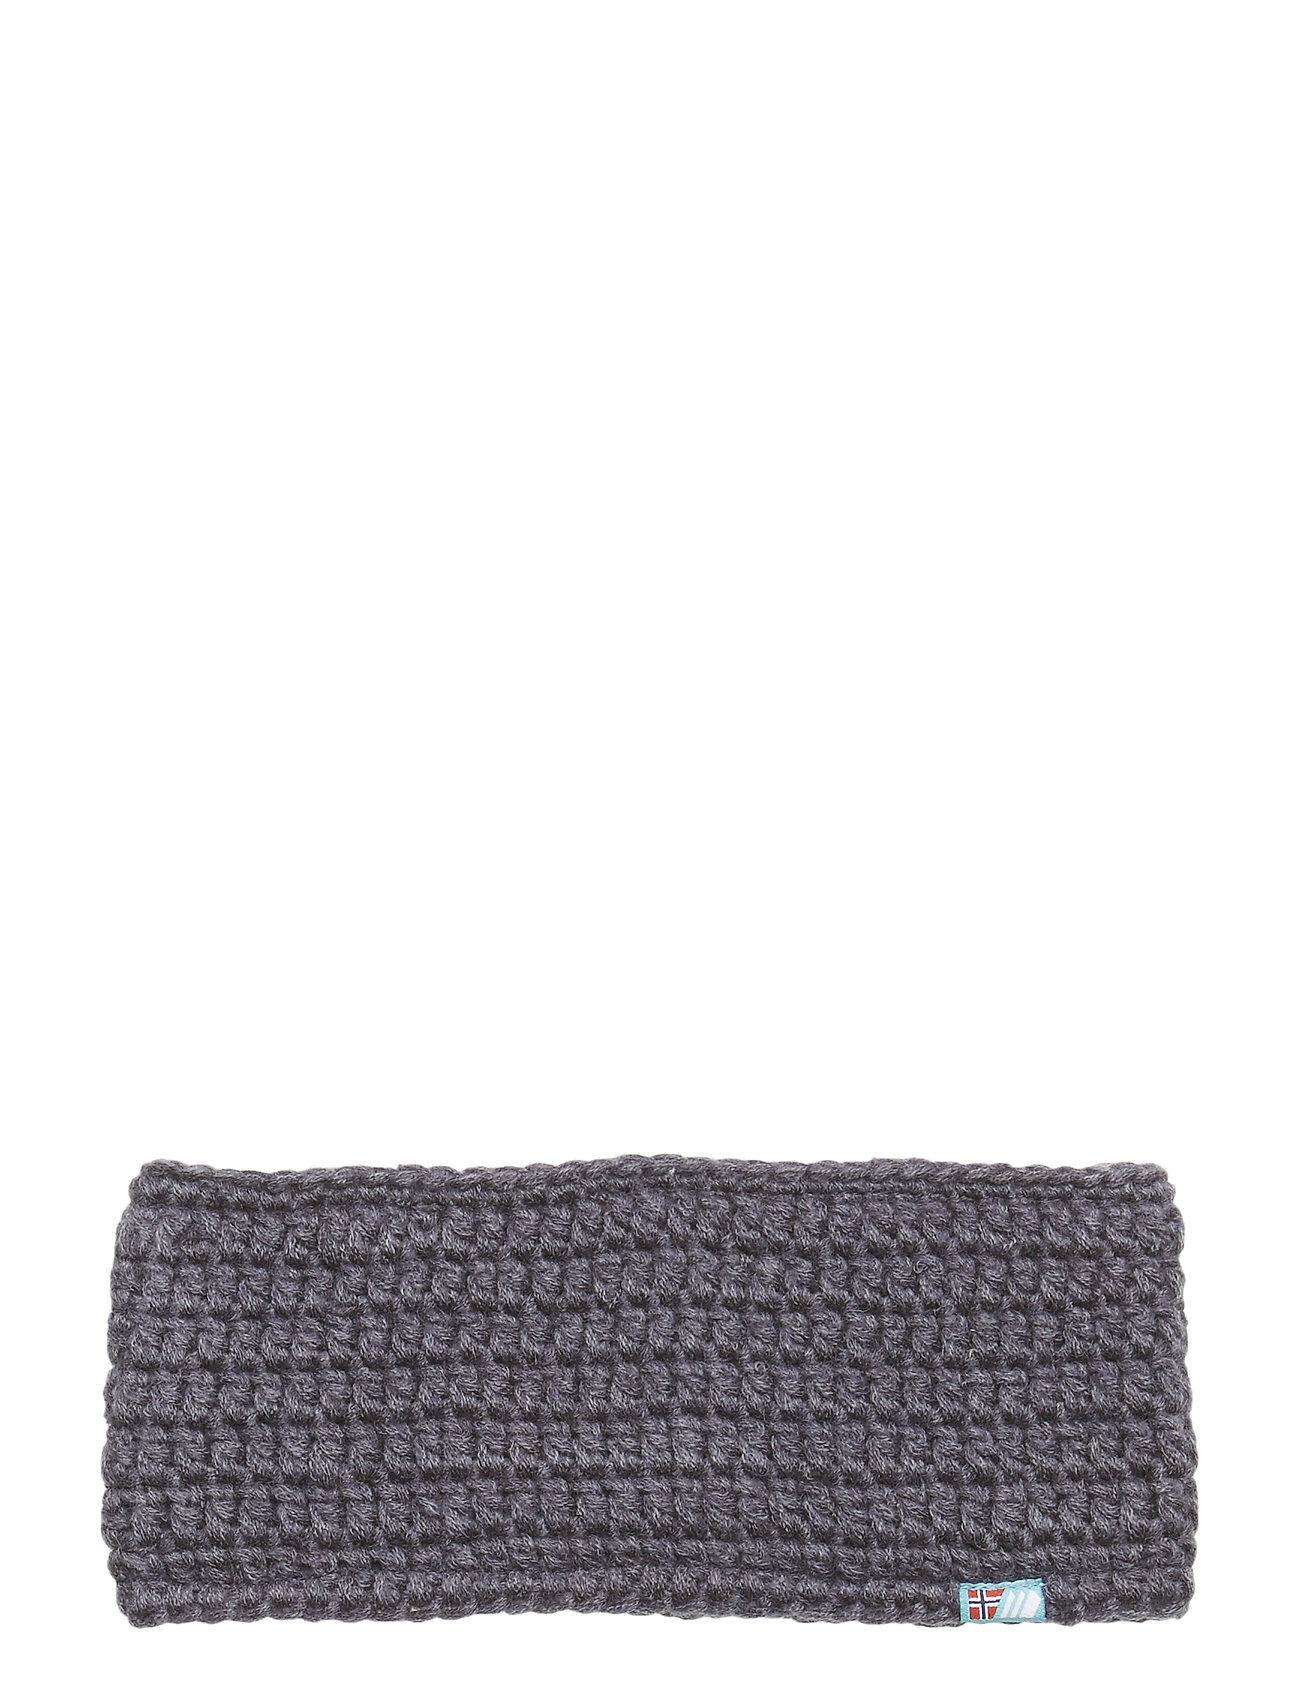 Skogstad Gytri Crocheted Headband